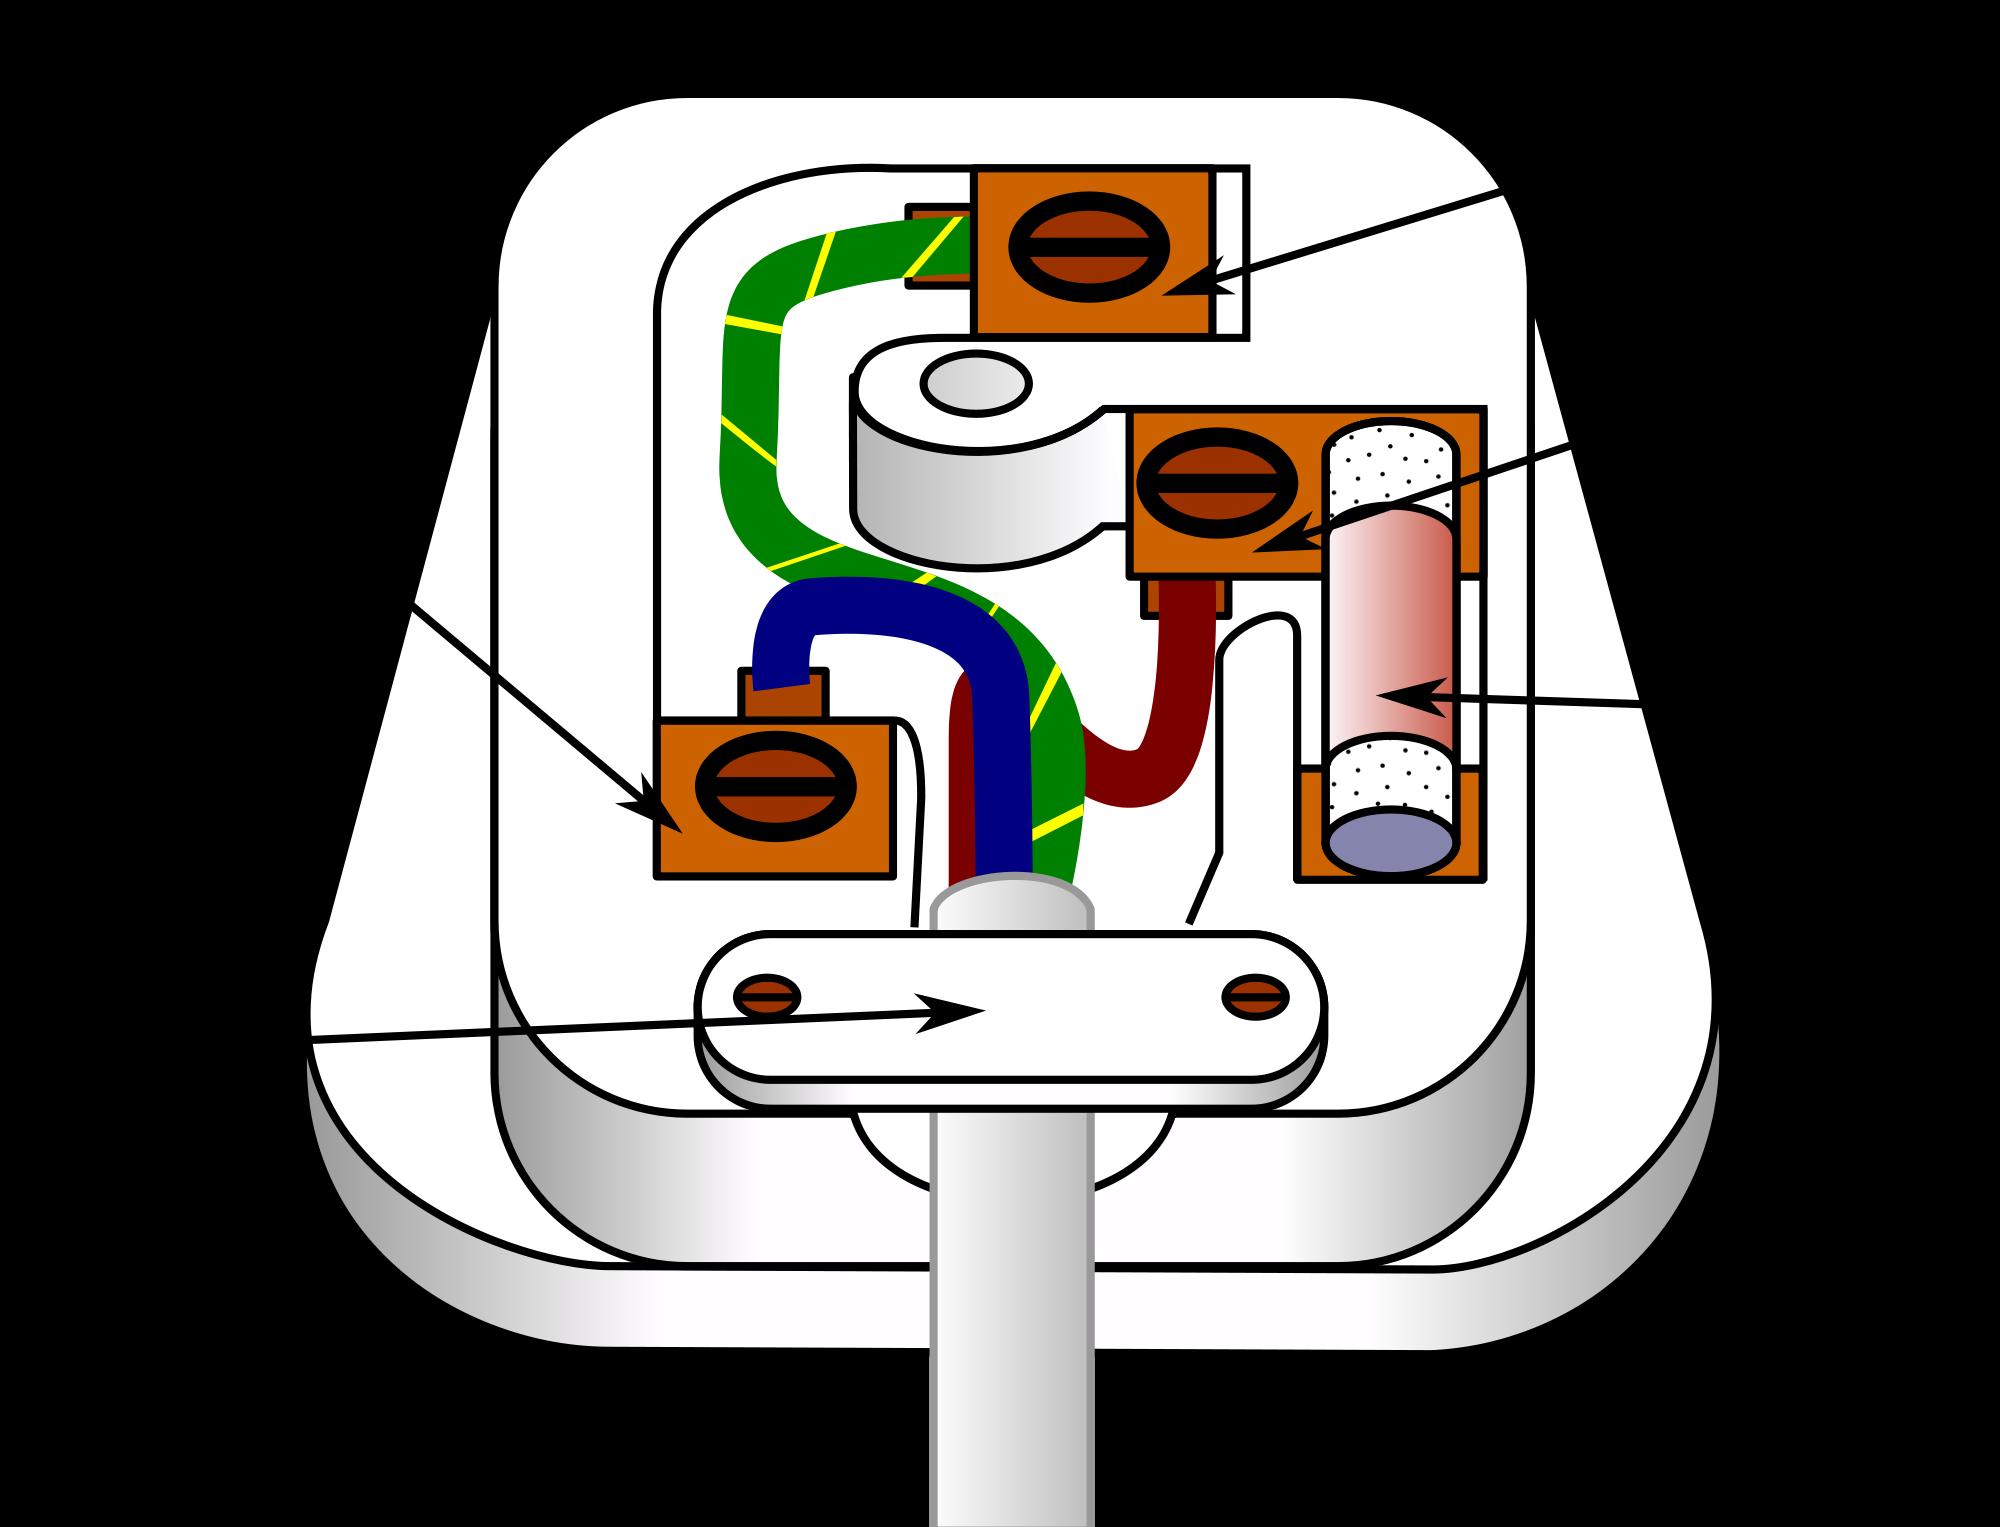 Pleasant Electric Plug Diagrams Wiring Diagram Wiring Cloud Faunaidewilluminateatxorg